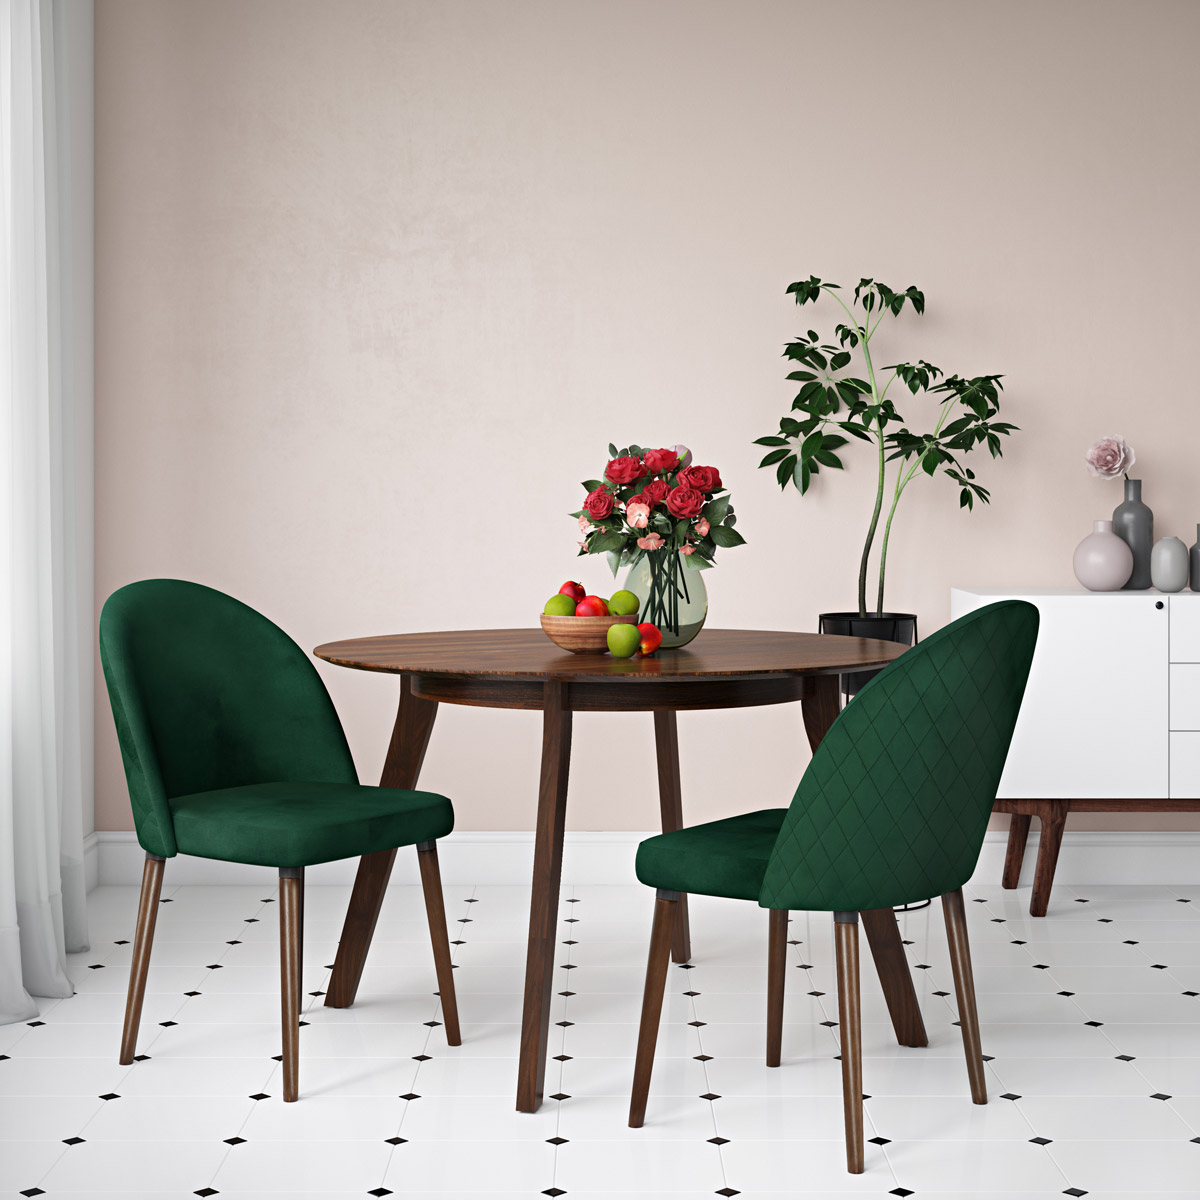 Dorel Kitchen Chairs 3D Rendering